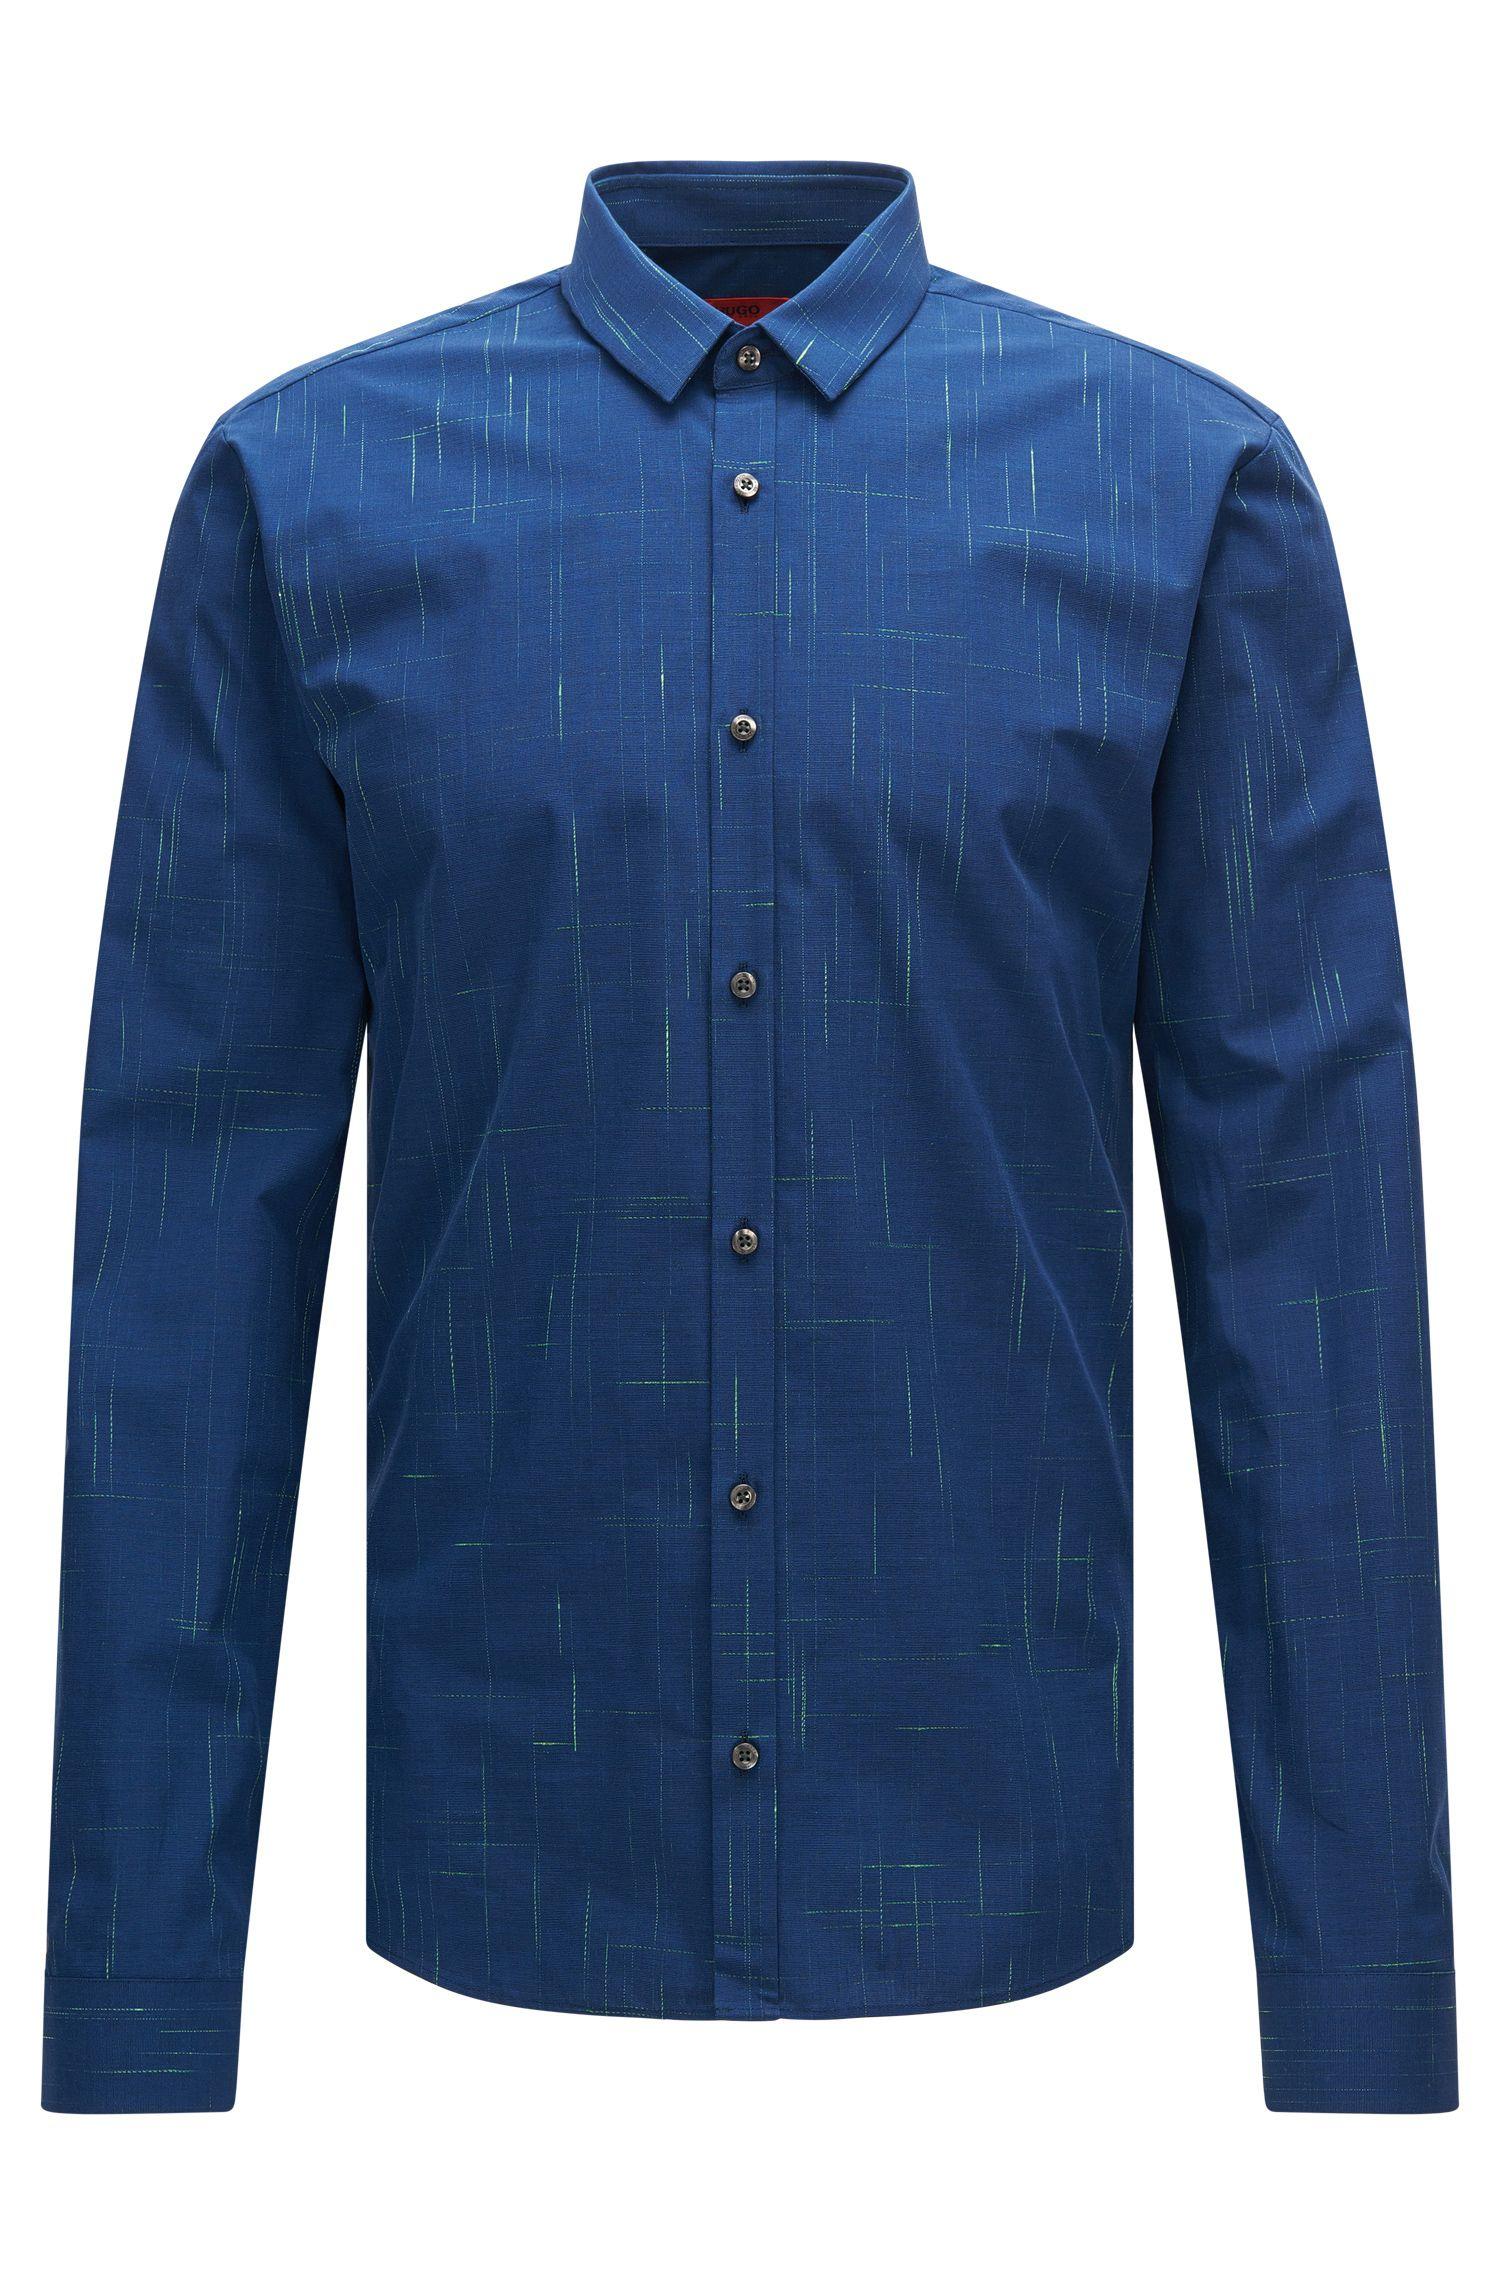 Dezent gemustertes Extra Slim-Fit Hemd aus Baumwolle: 'Ero3'